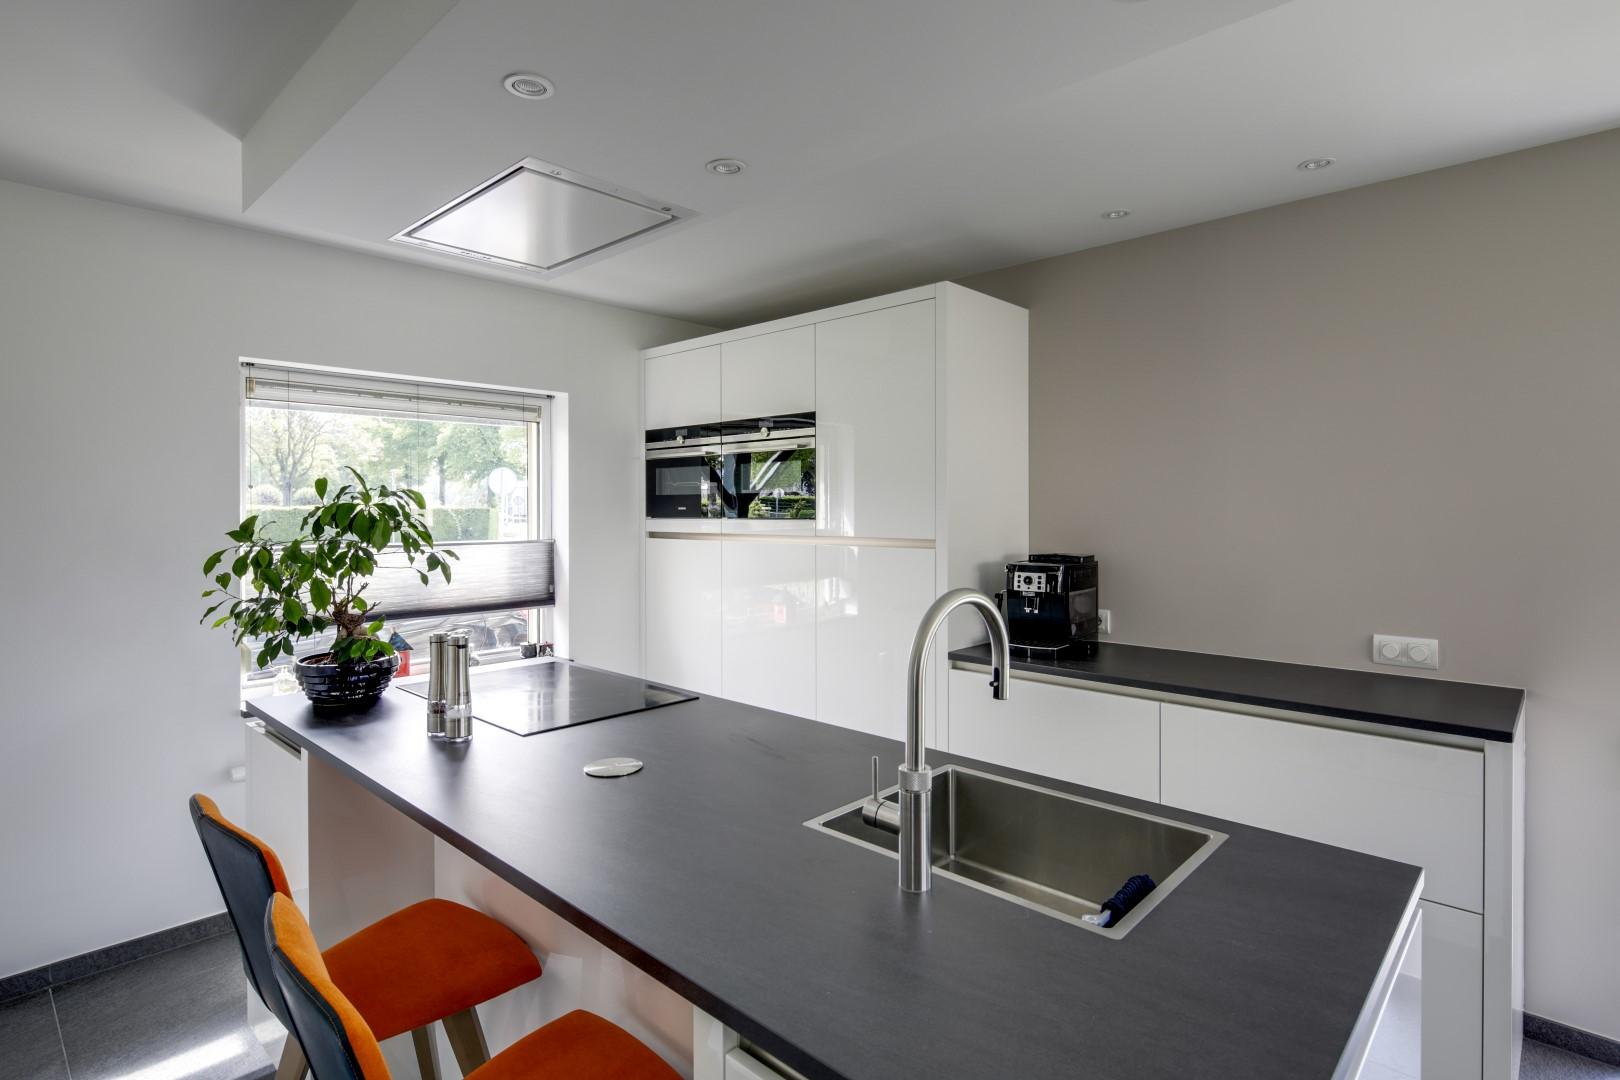 Tristar Keuken Model Radius High Level Keukens Keuken High Level Keukens Nijmegen Arnhem Bemmel